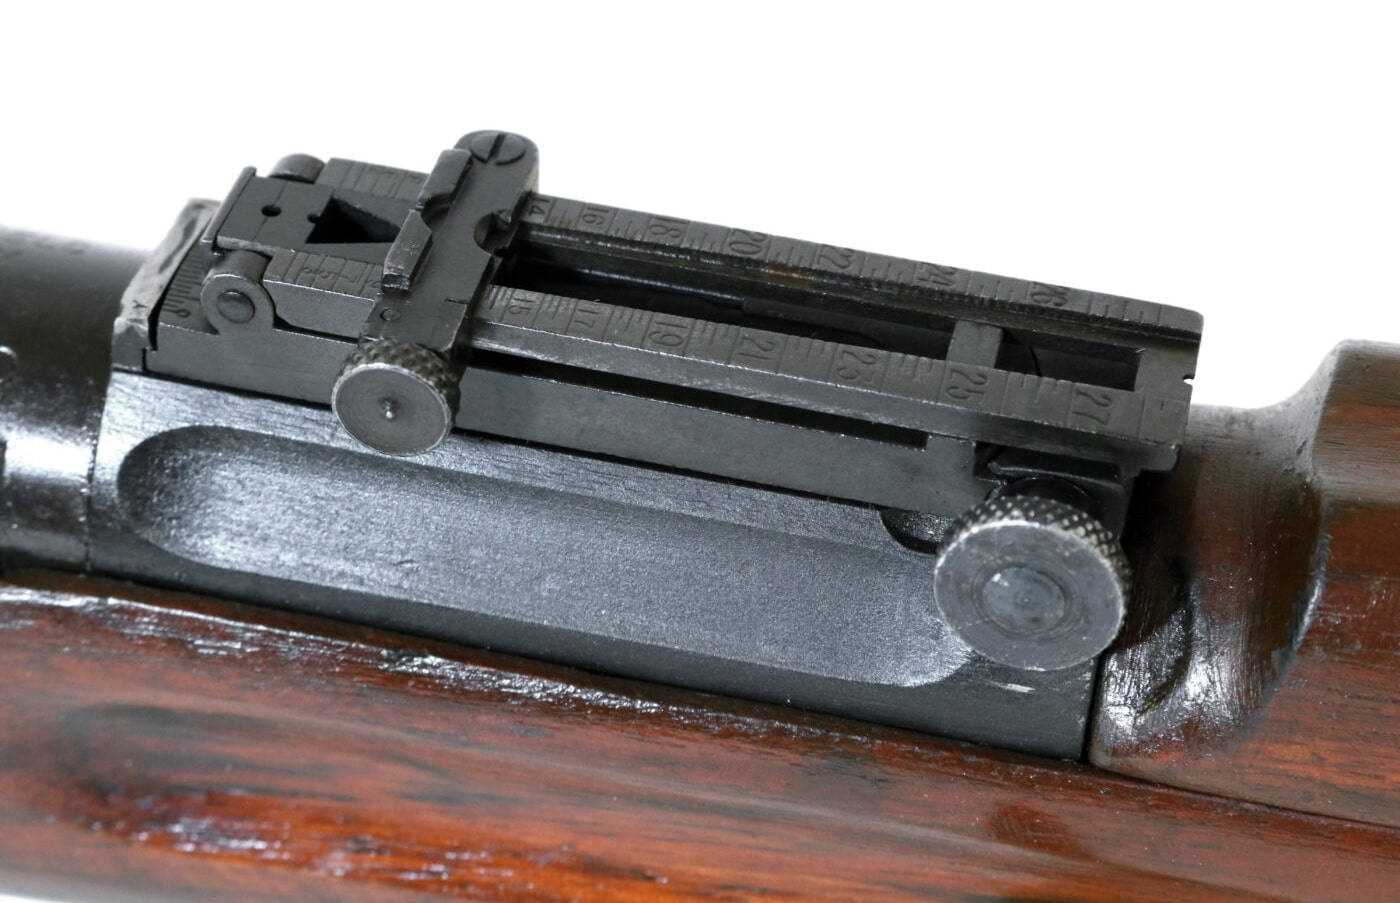 Rear sight of a 1903 rifle